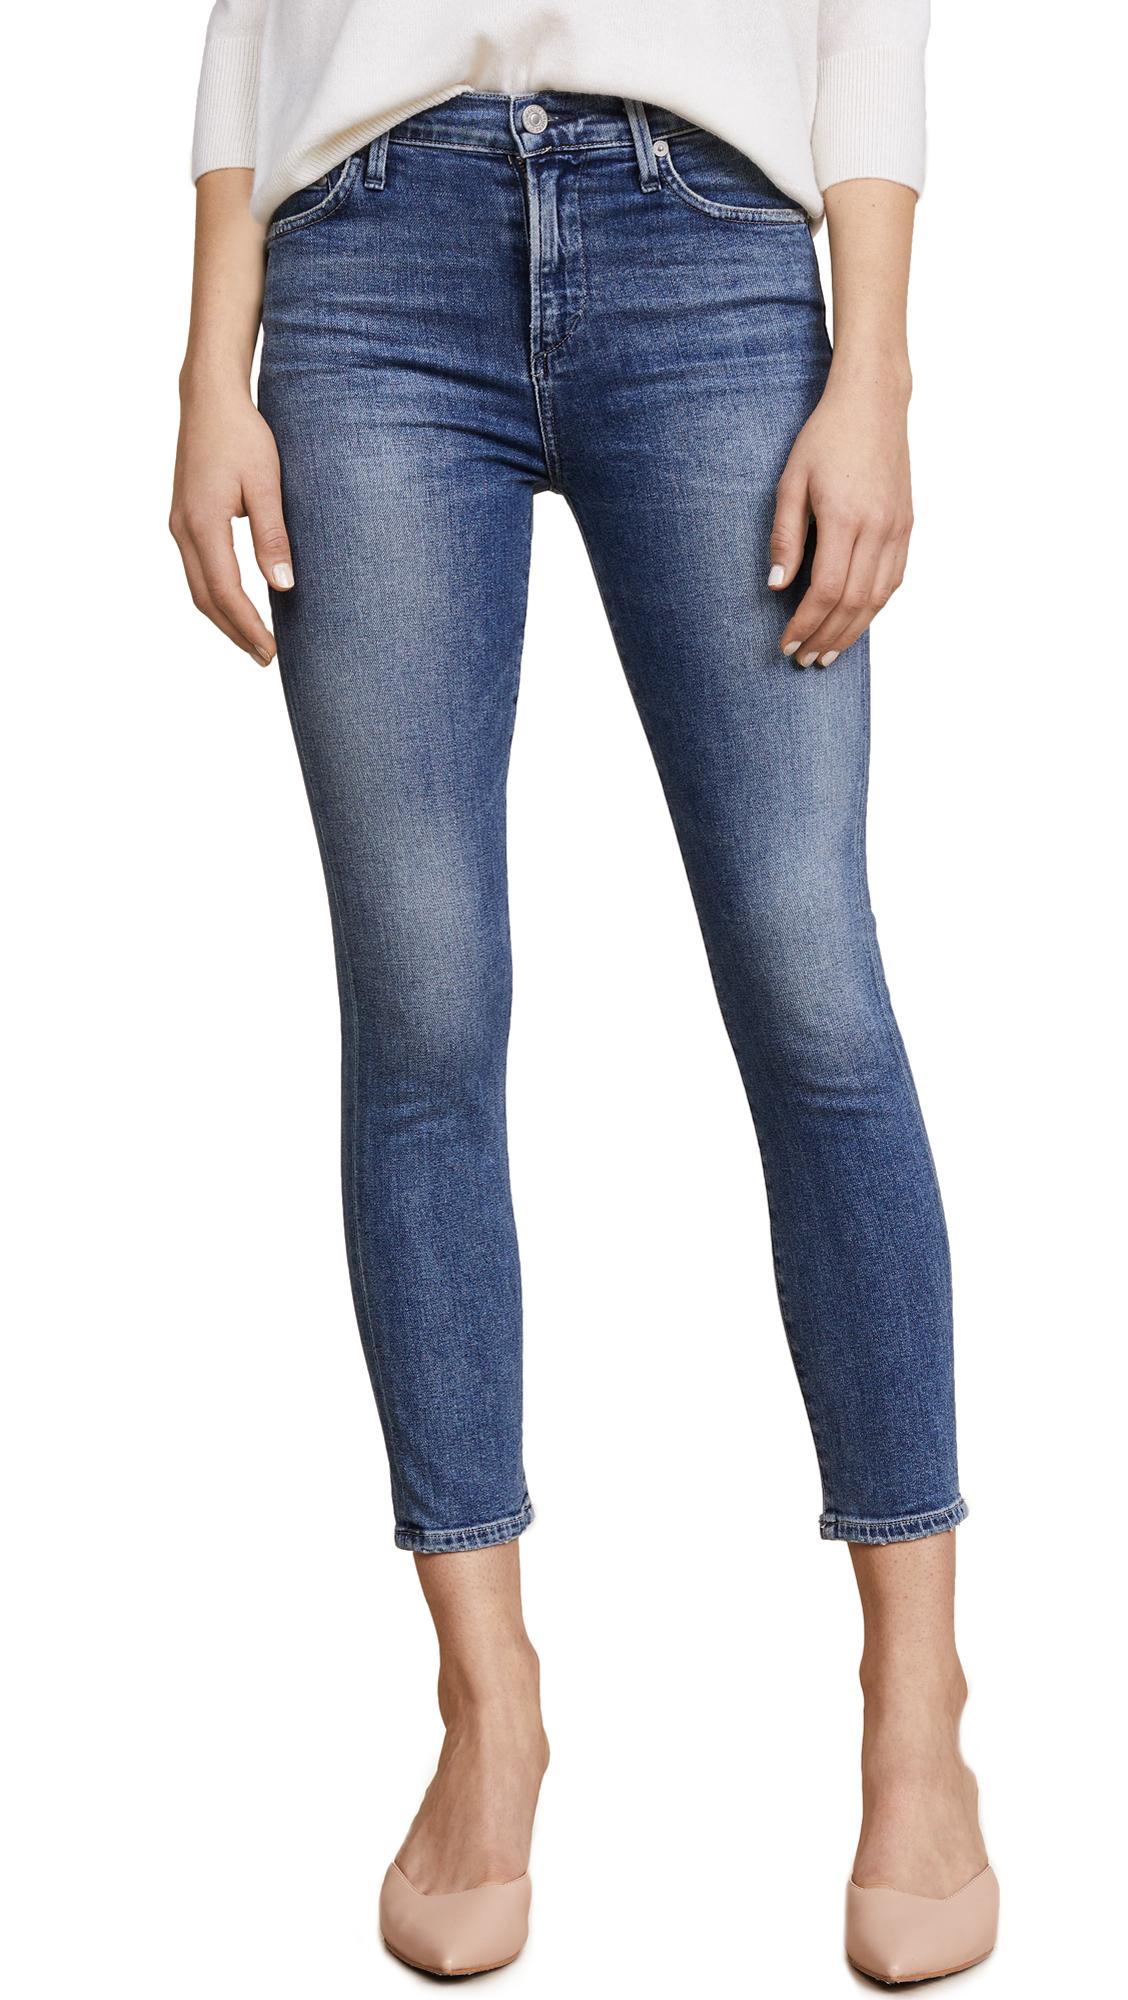 Citizens of Humanity Rocket Skinny Jeans In Orbit